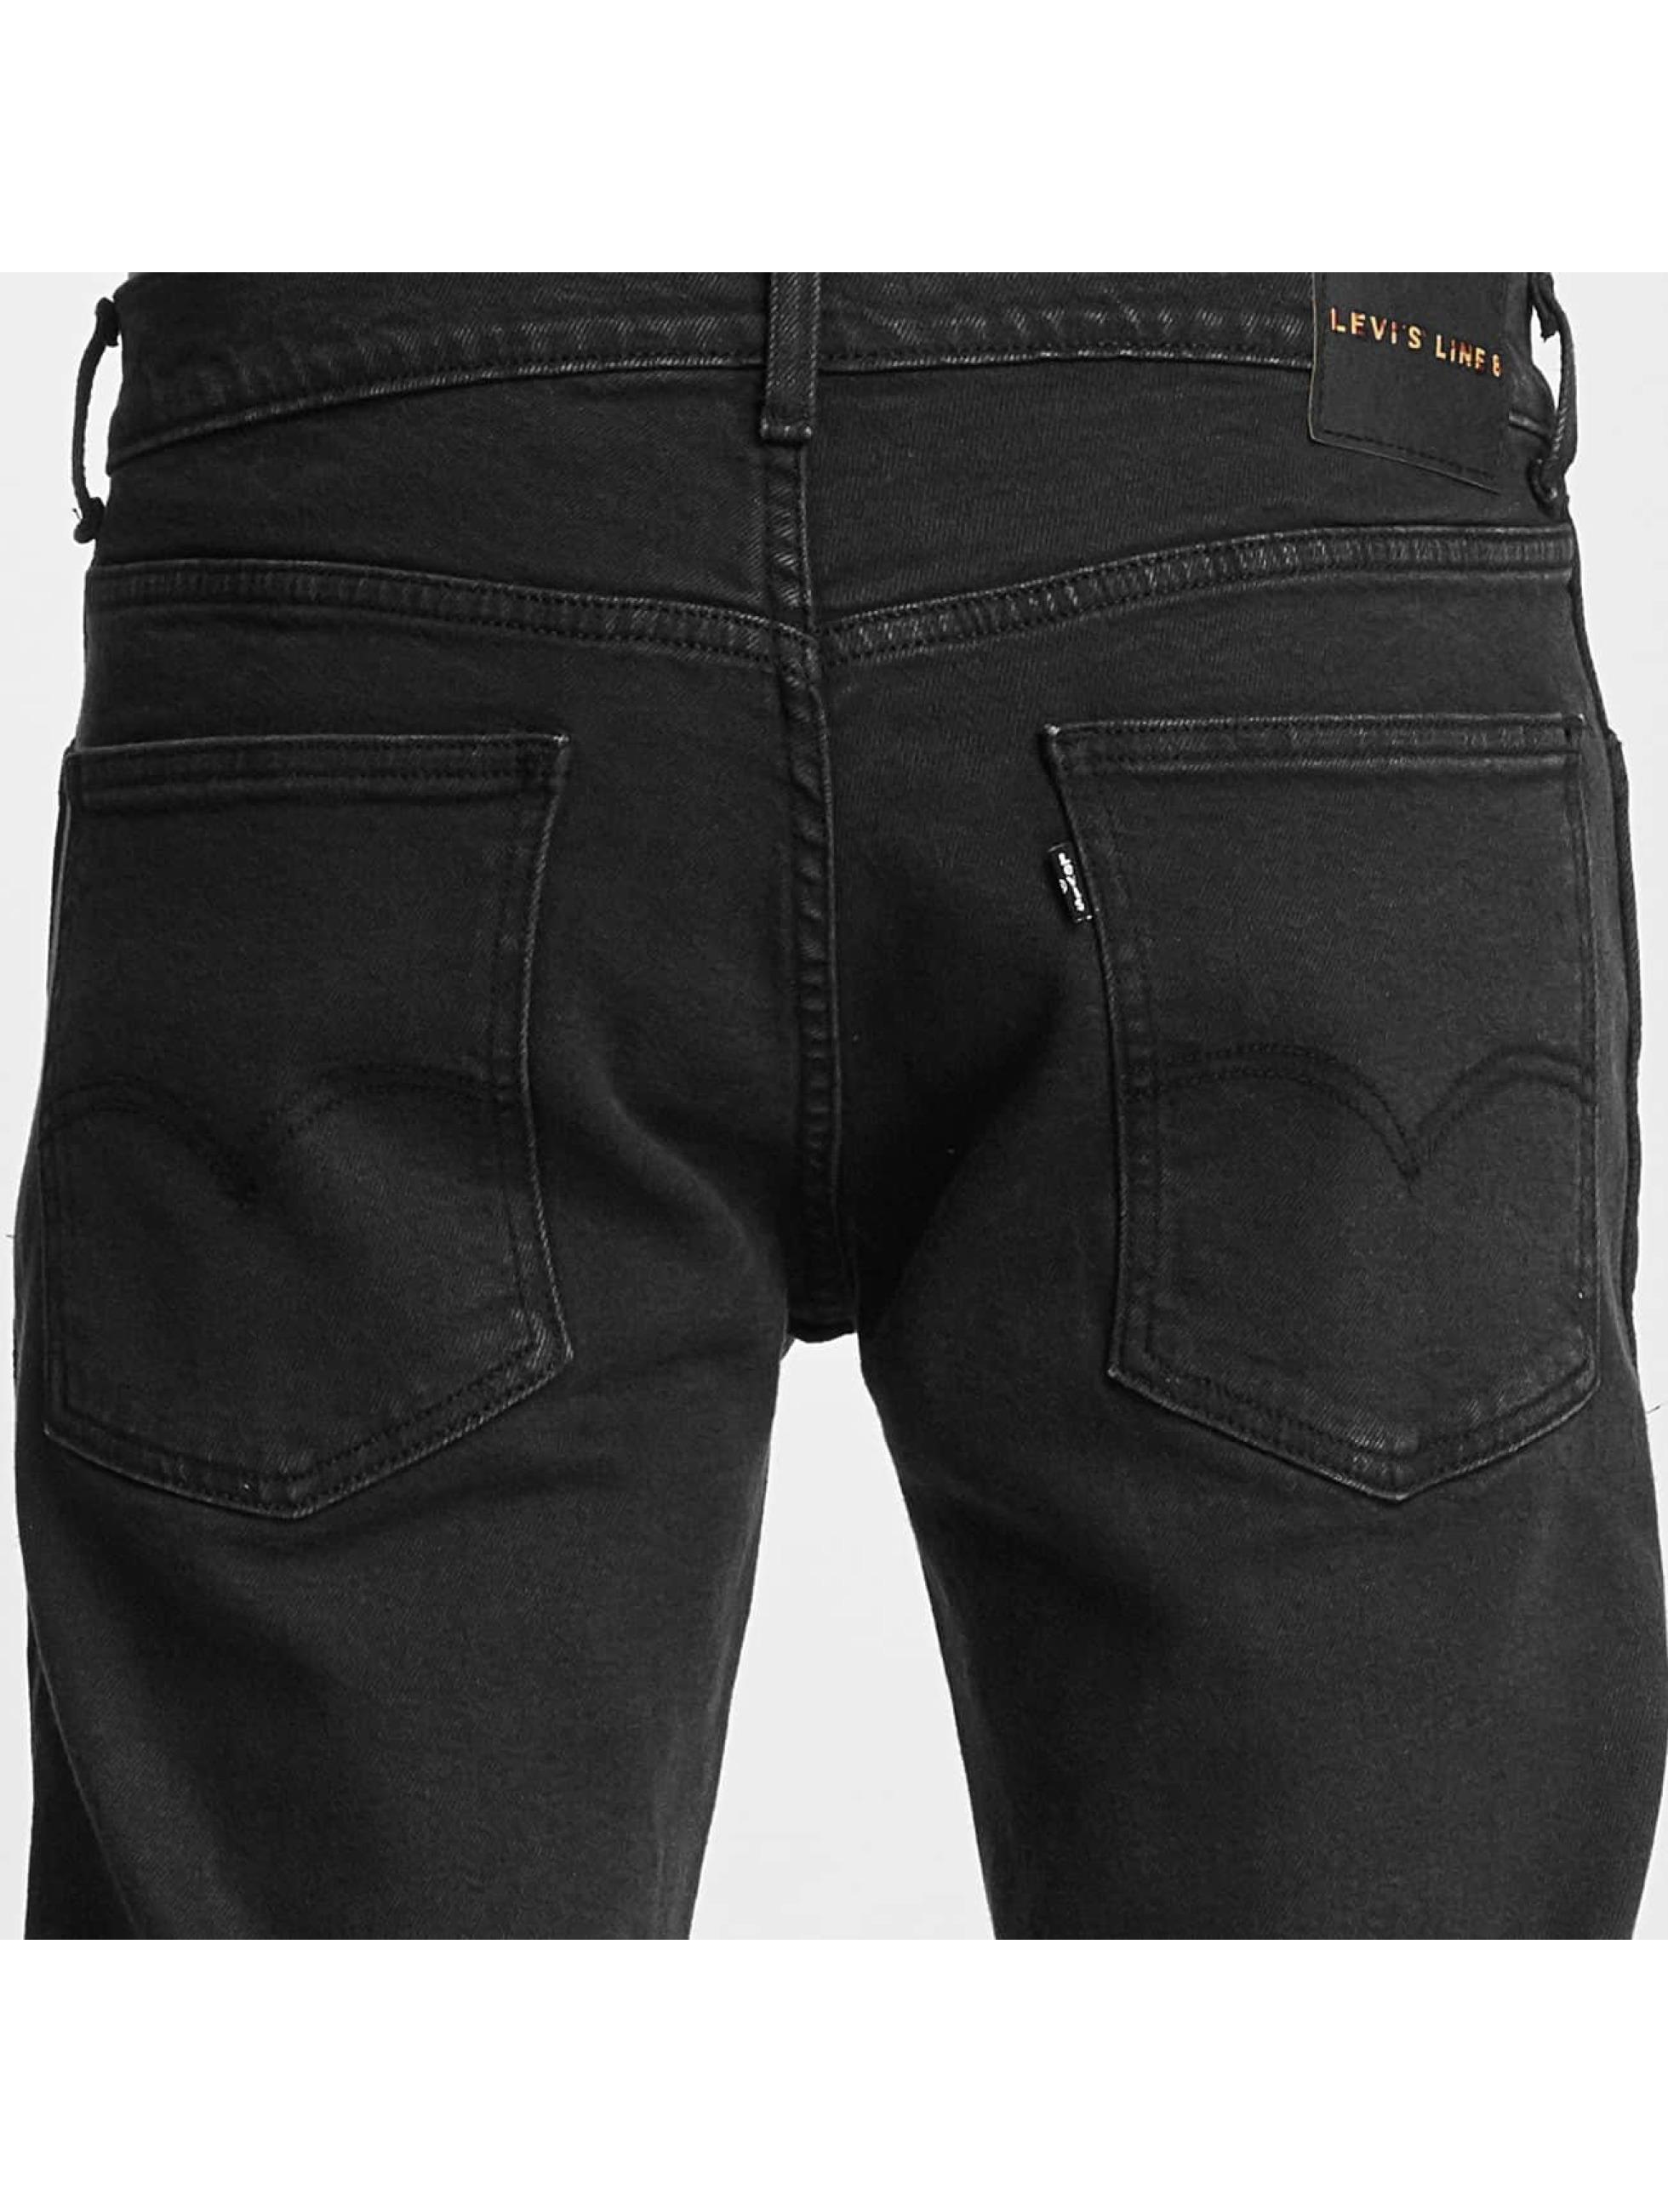 Levi's® Slim Fit Jeans L8 black